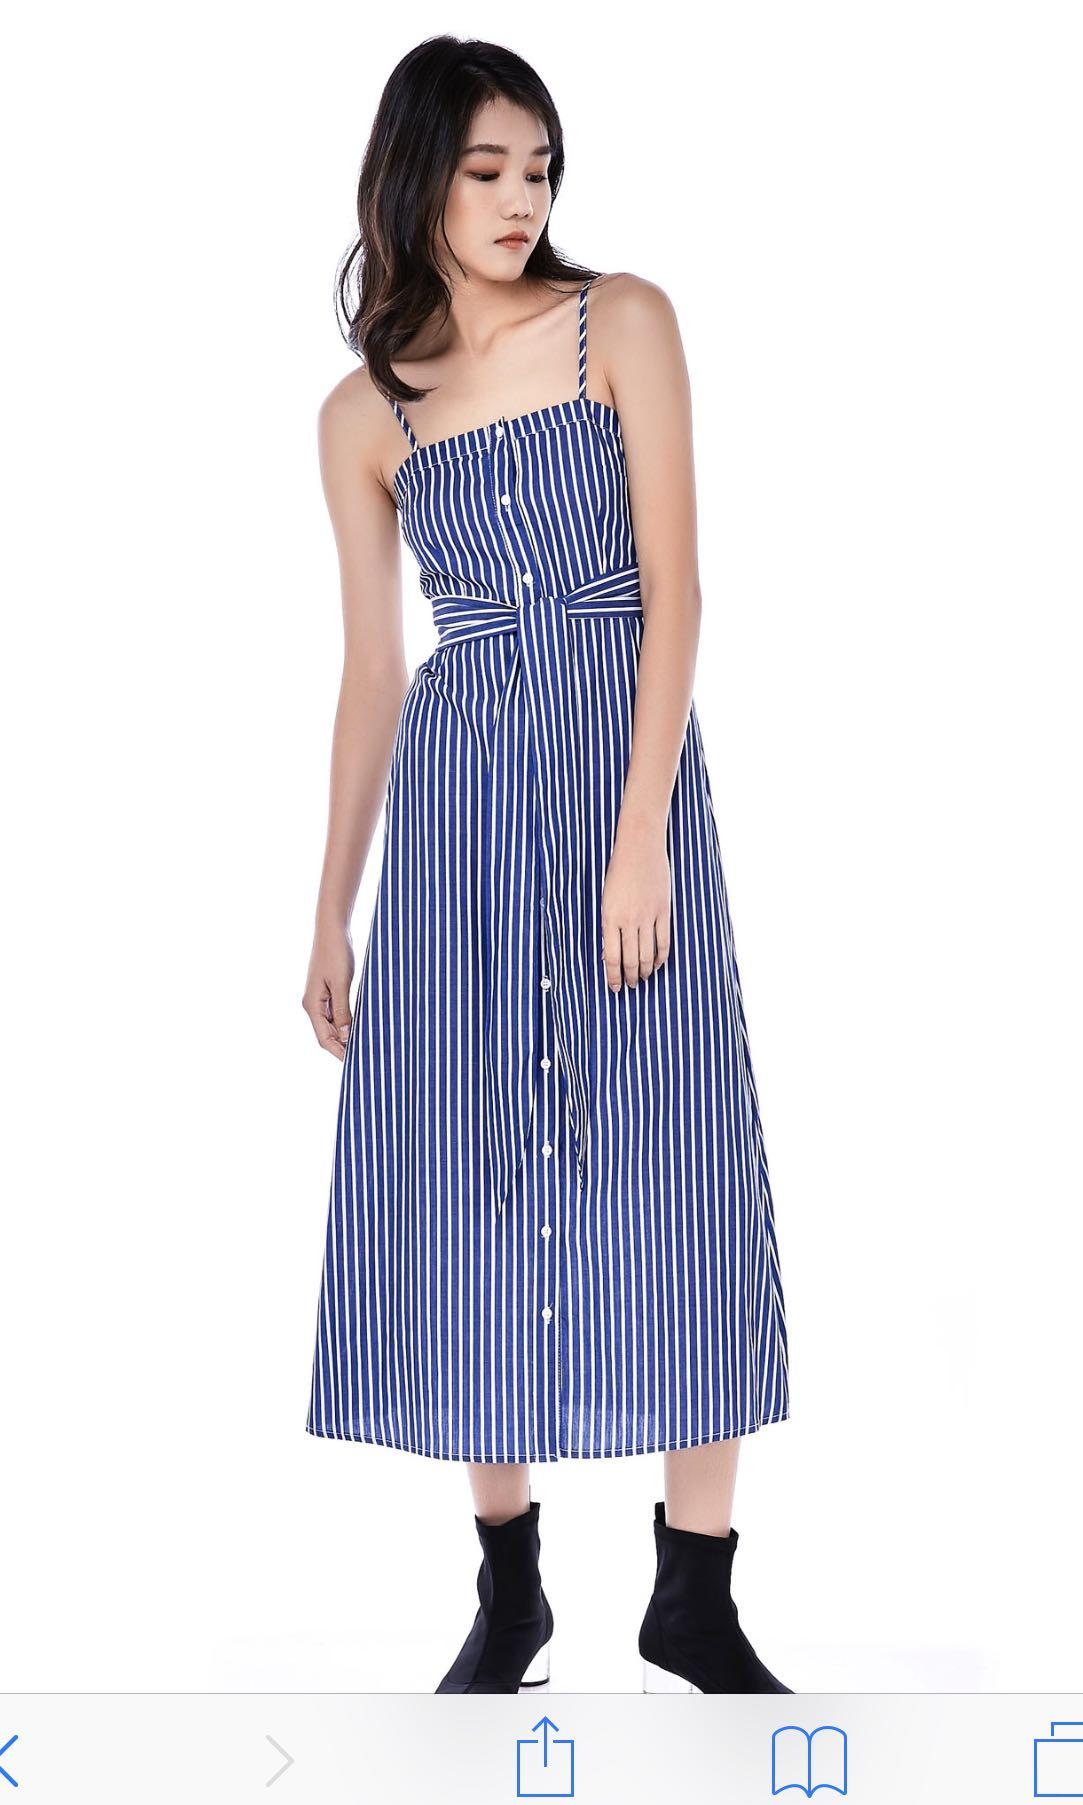 72001fa9d37 TEM Aries Button-Down dress in blue stripes